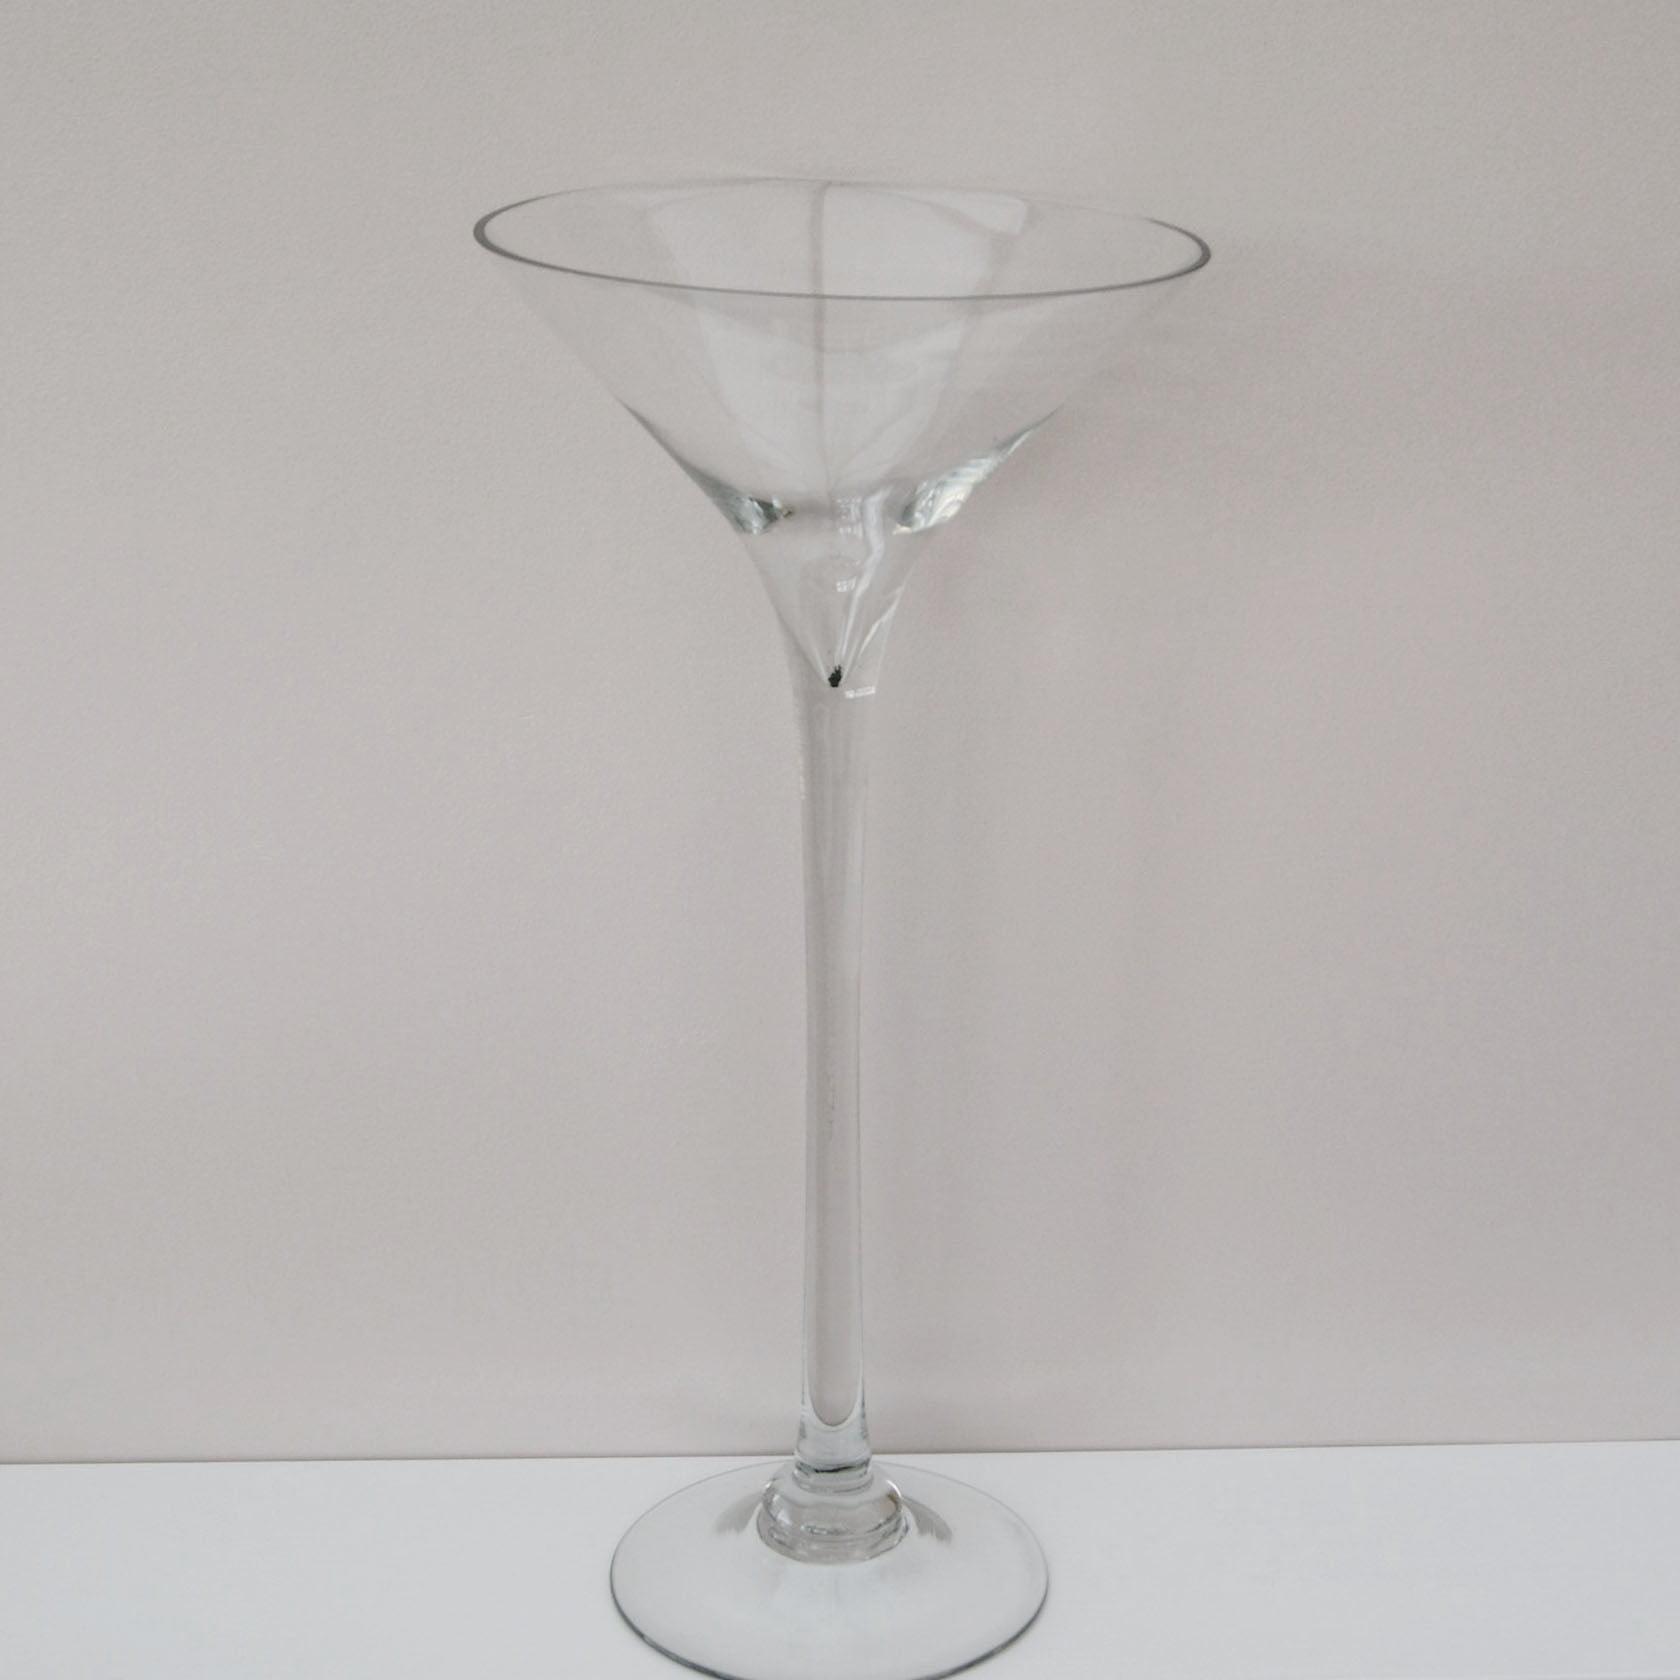 Jumbo Martini Glass Vase Centerpiece 16 inch Walmart